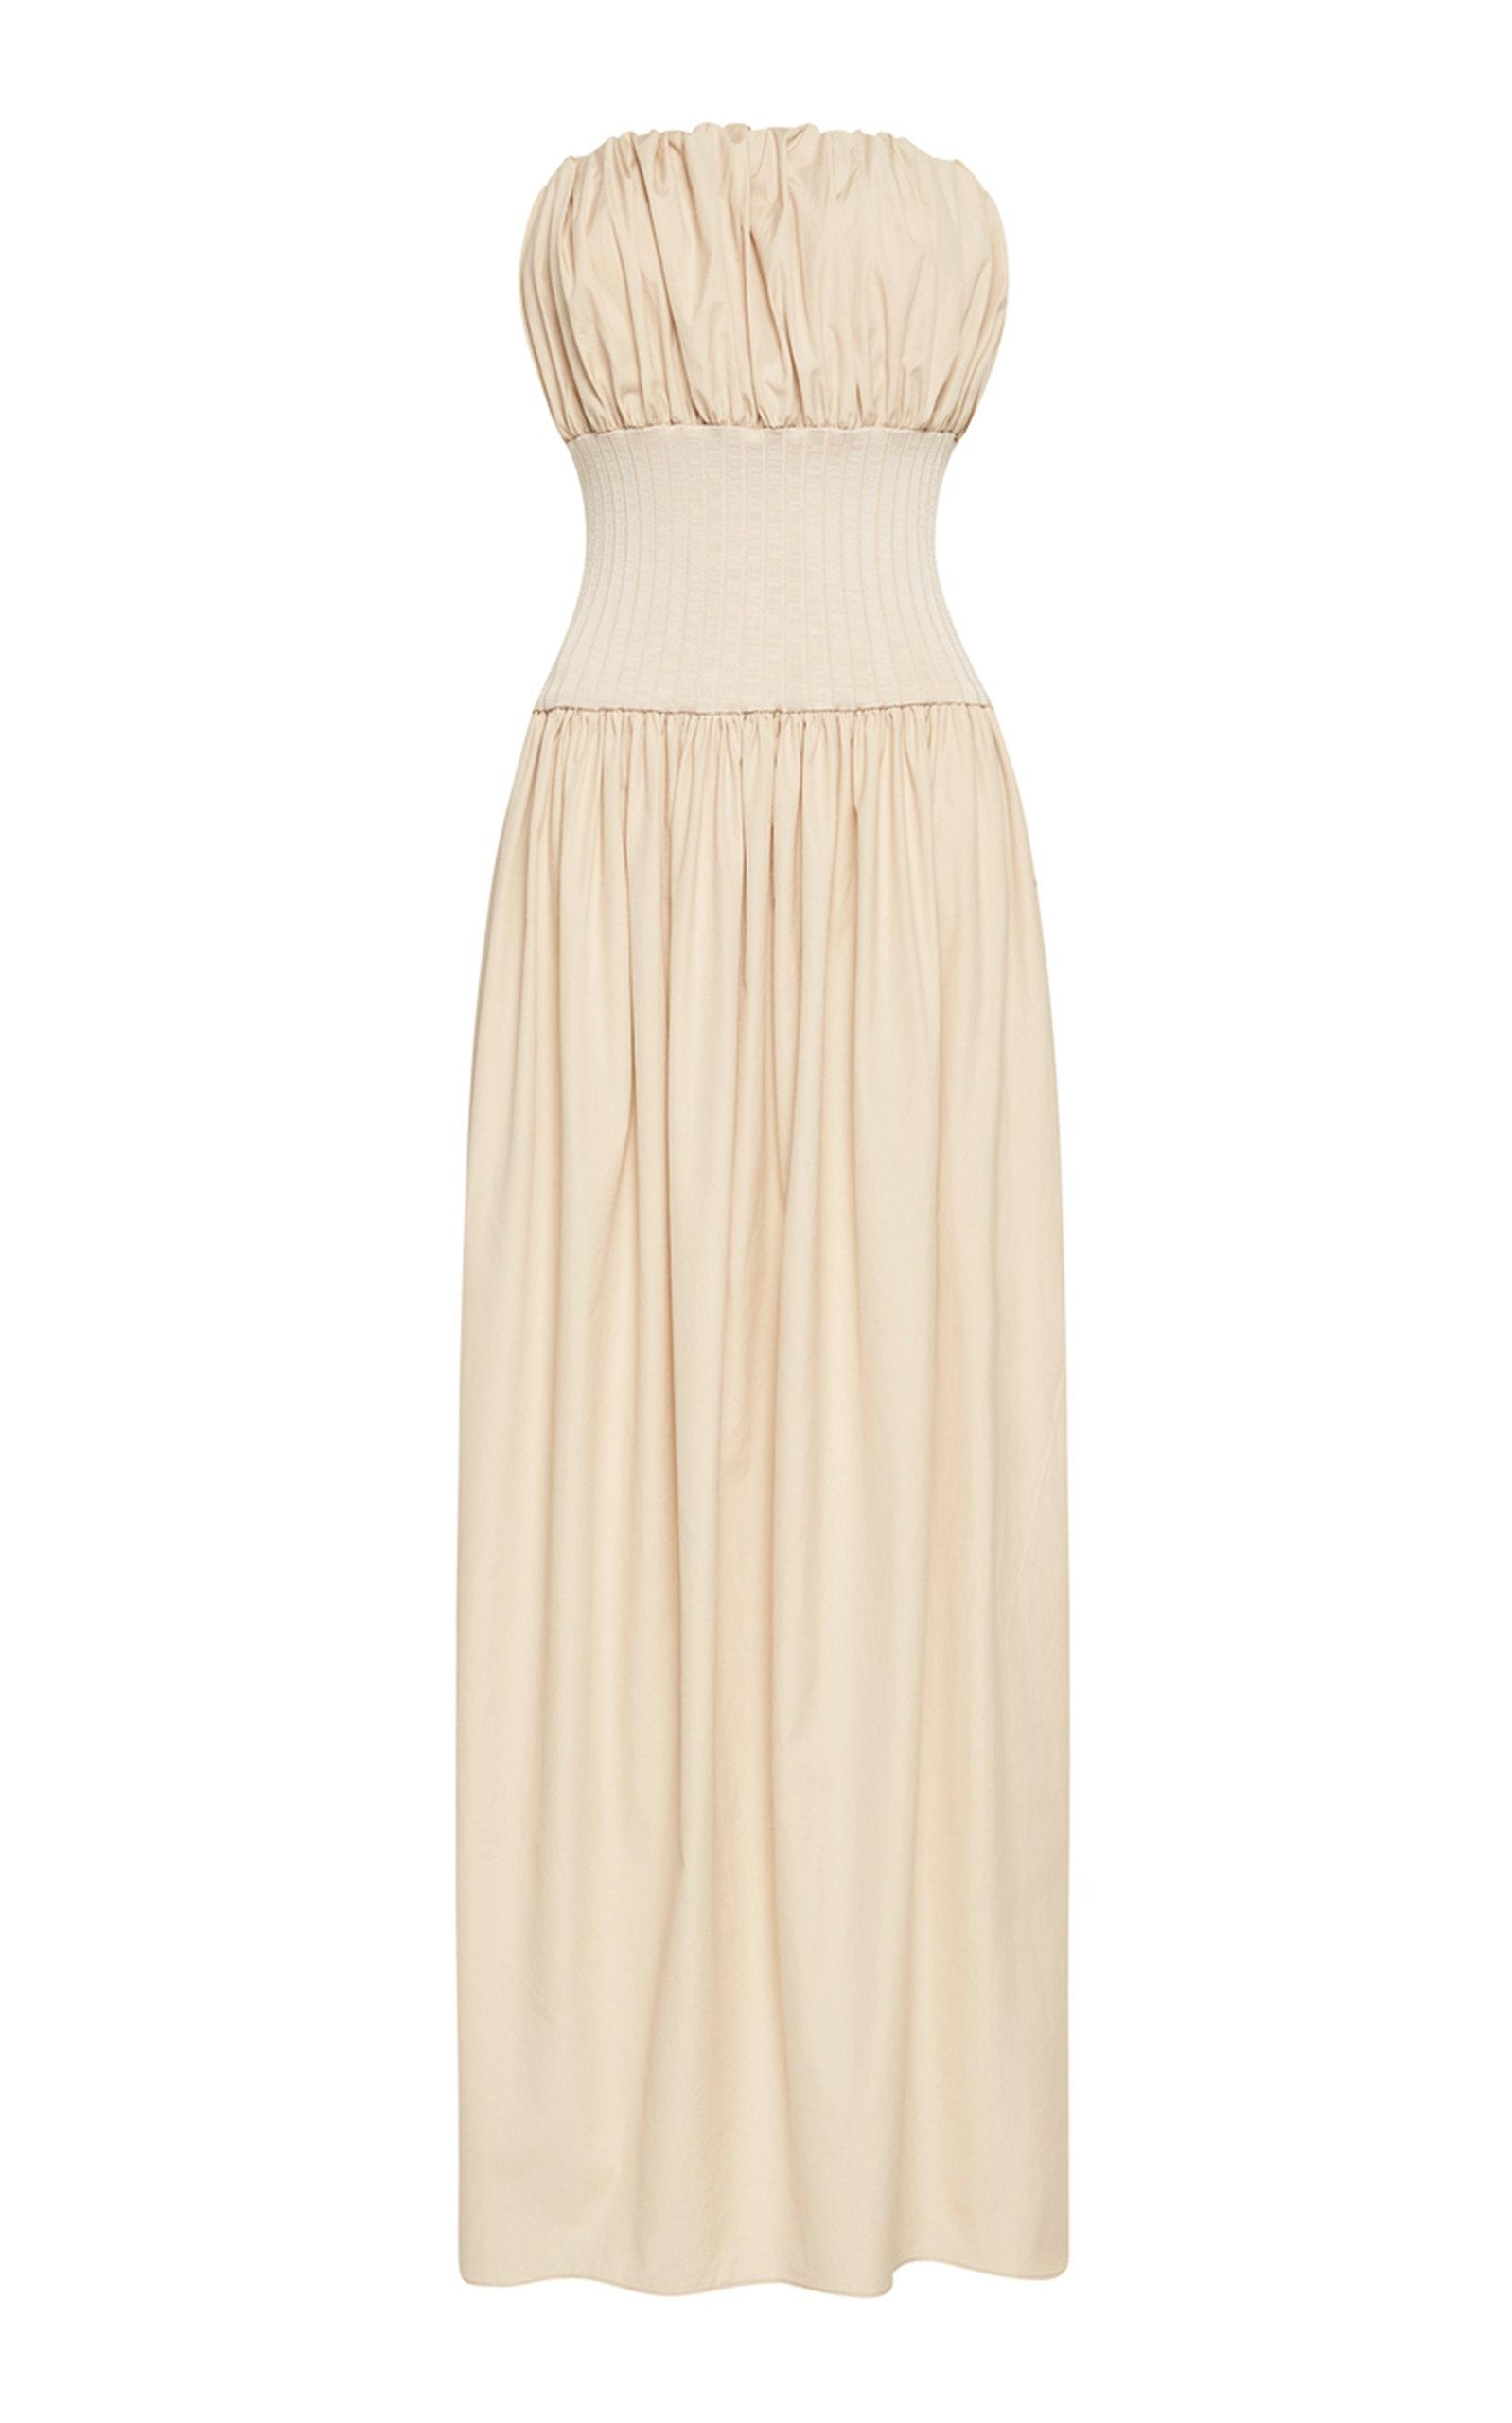 Women's Strapless Cotton Maxi Dress